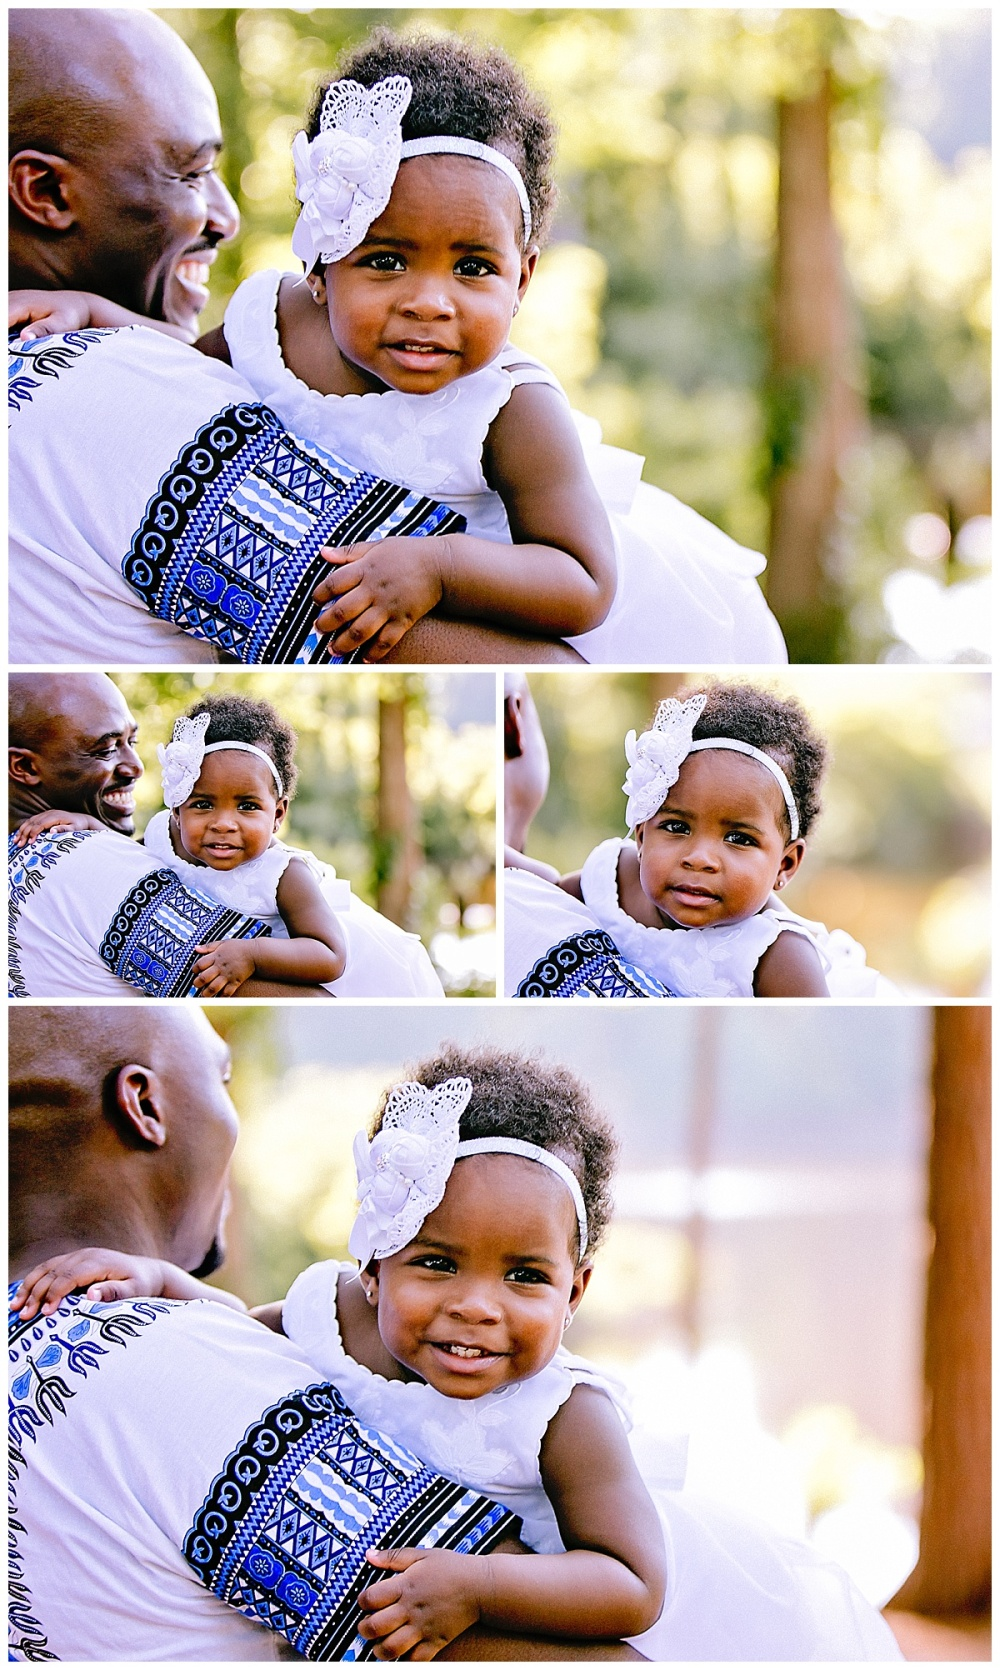 Carly-Barton-Photography-Family-Session-Kilgore-Texas-Twins-1-year-birthday-cake-smash-Olowo-family-photos_0032.jpg